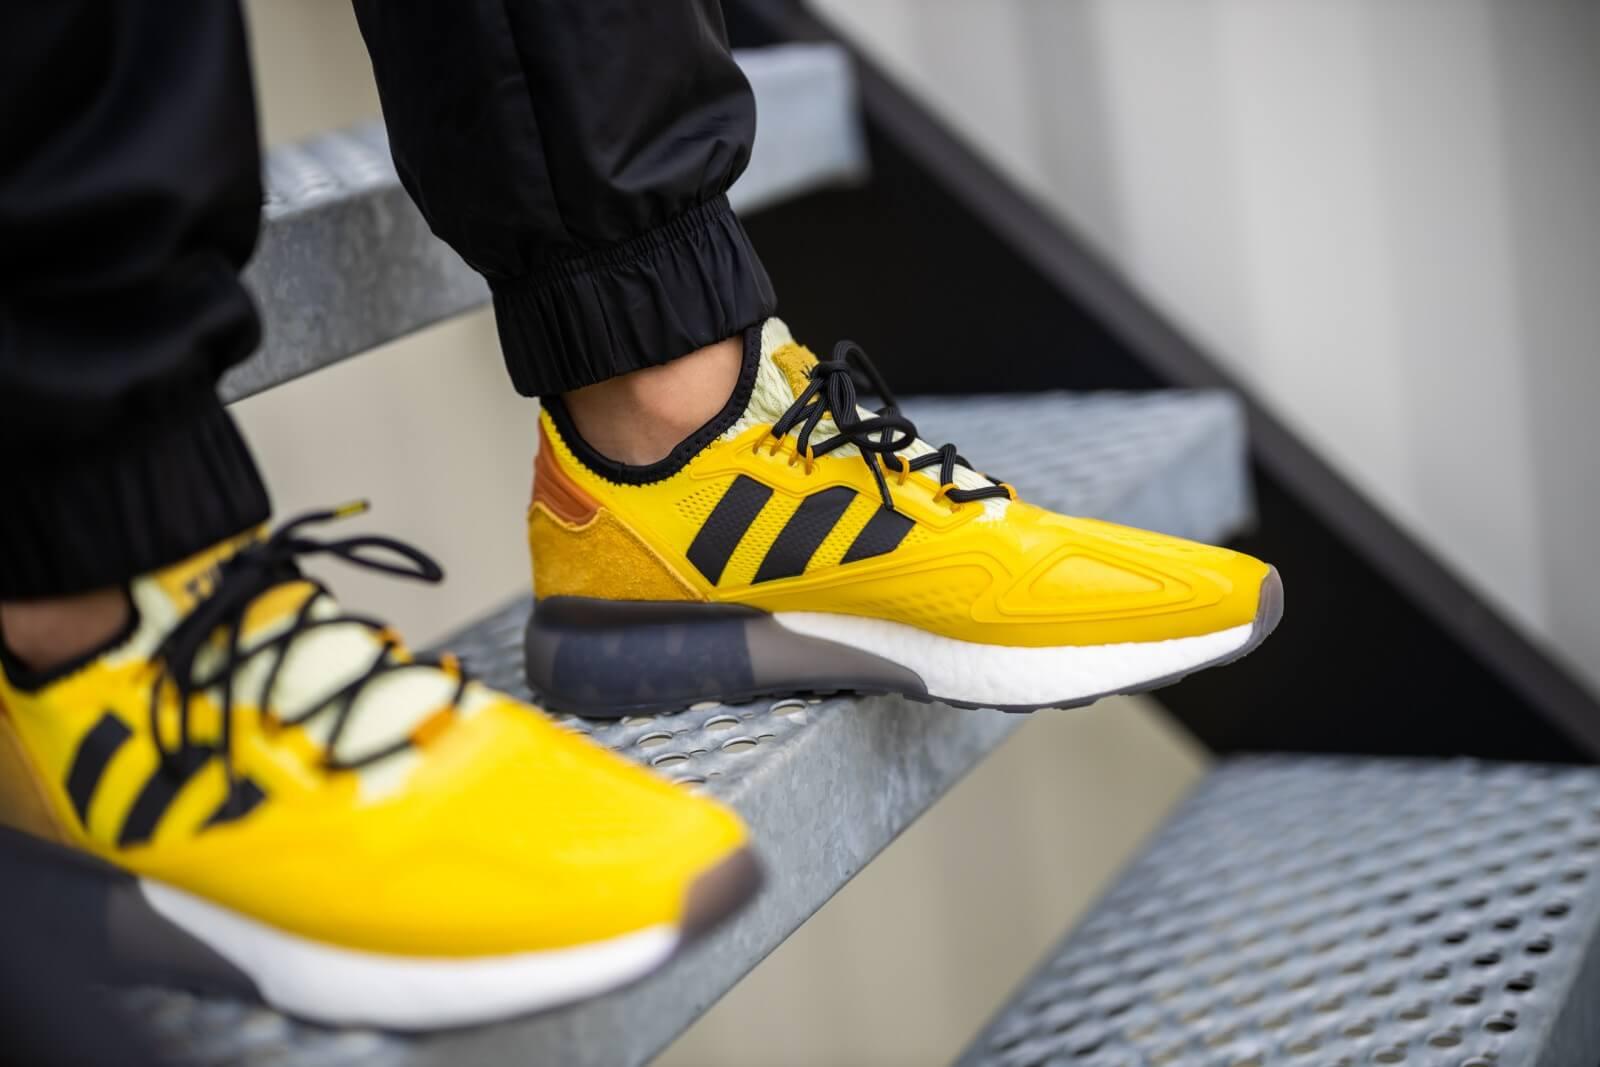 Adidas x Ninja ZX 2K Boost Yellow/Legacy Gold-Tech Copper